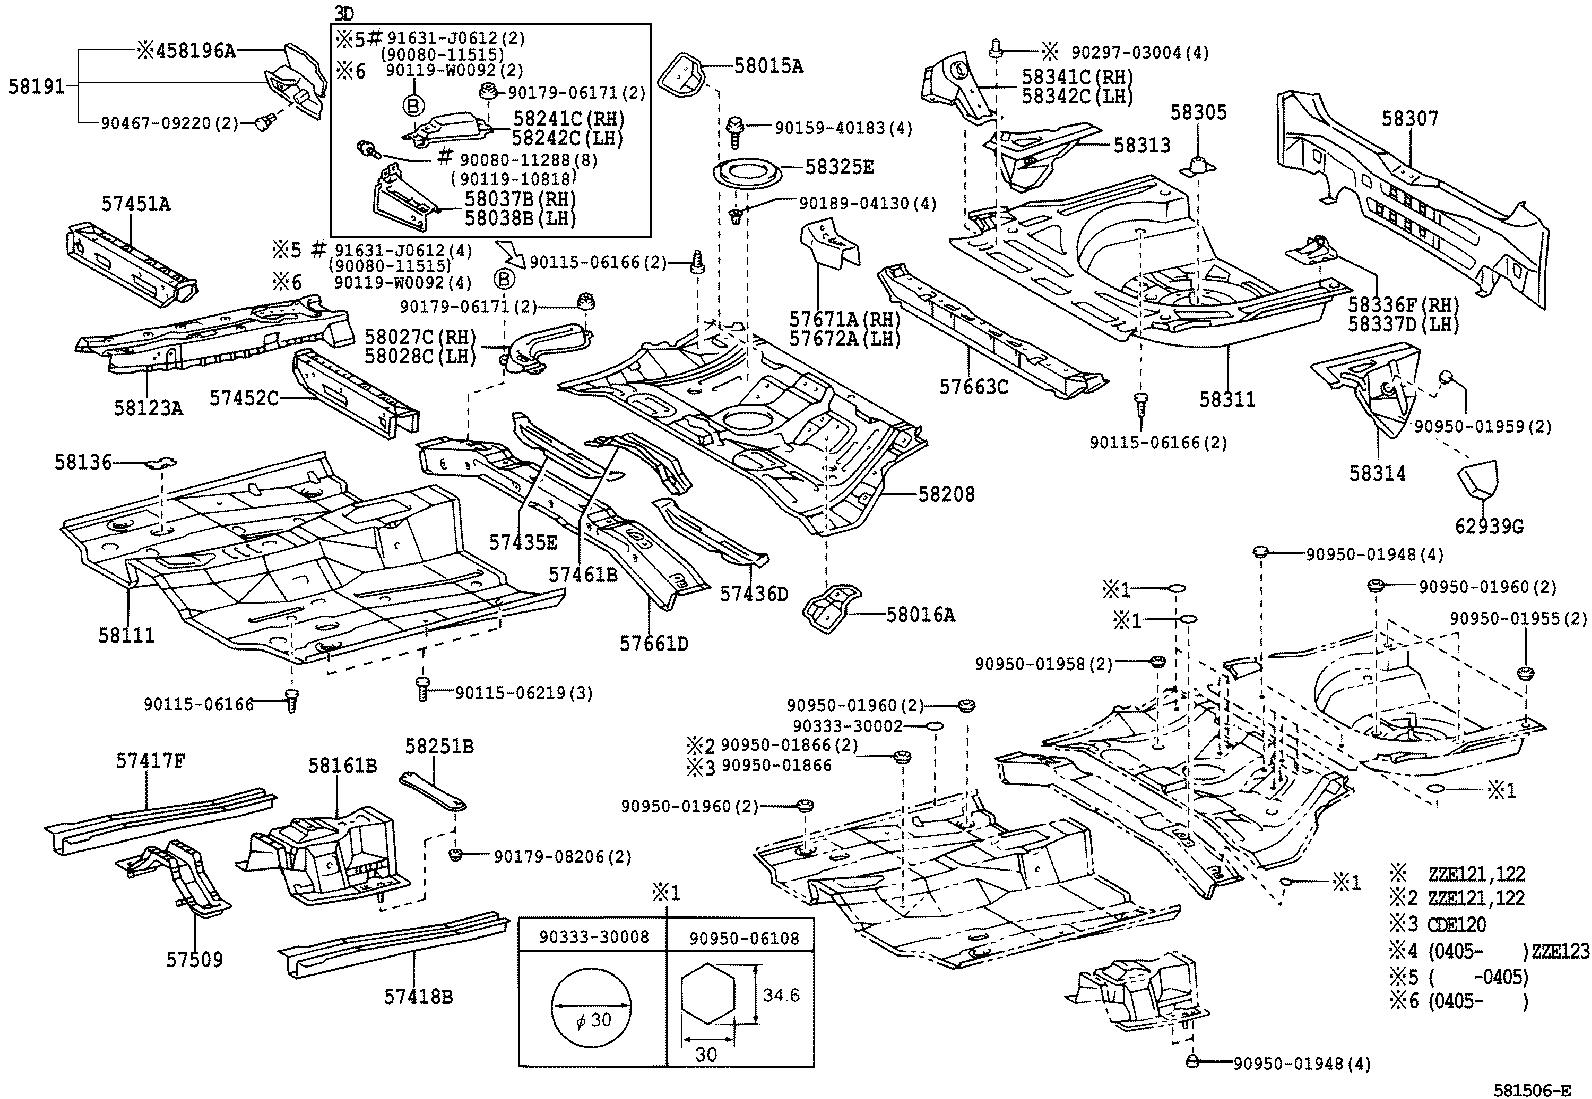 Jaguar Xj6 Engine Diagram Jaguar Auto Wiring Diagram